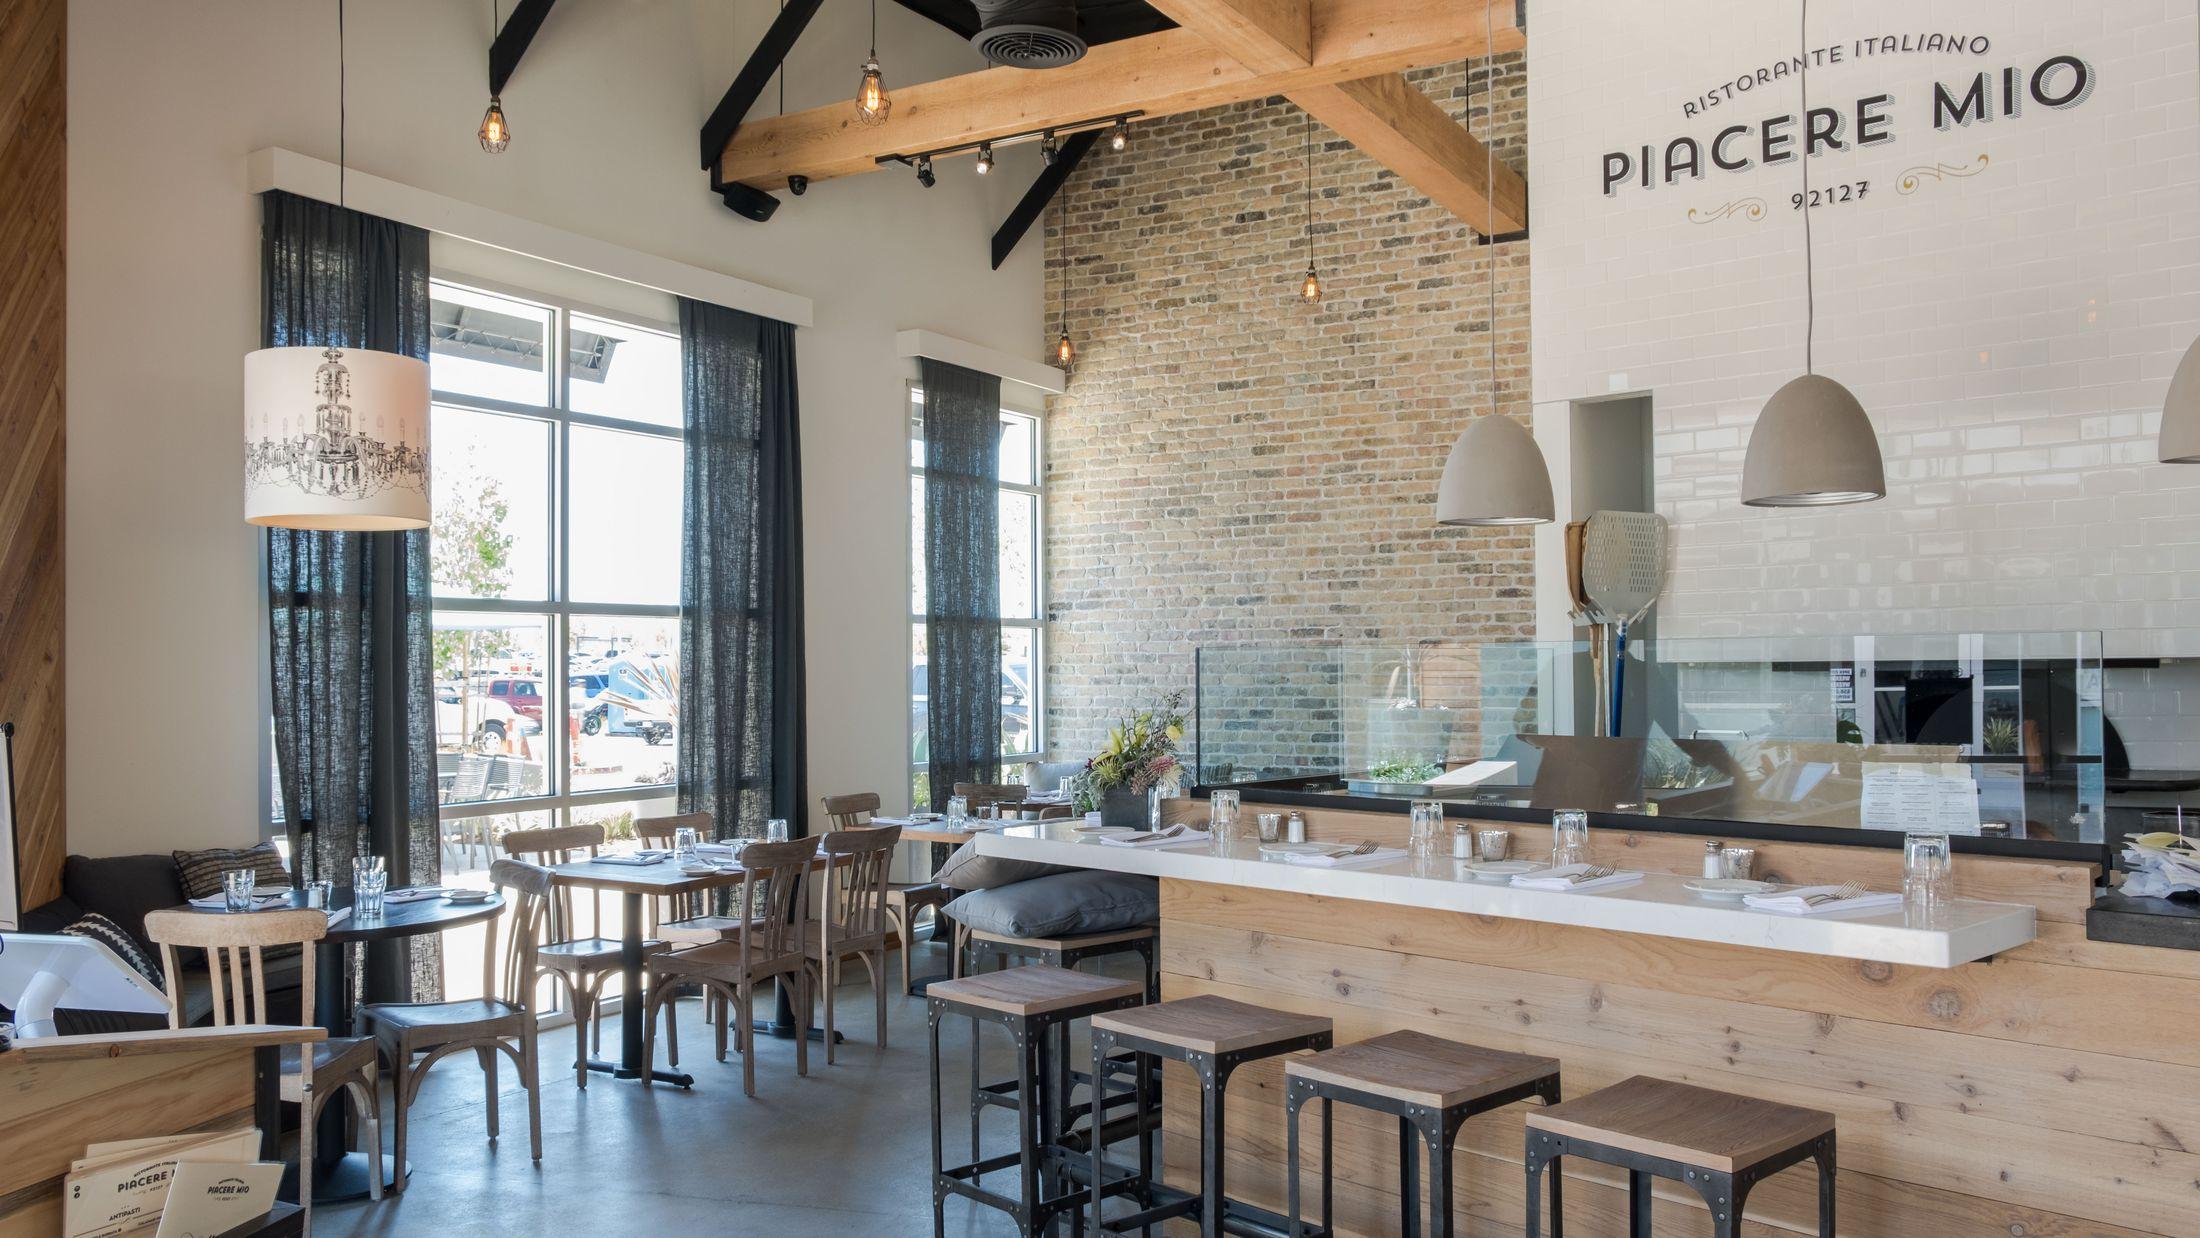 Best Authentic Italian Restaurant Piacere Mio North County